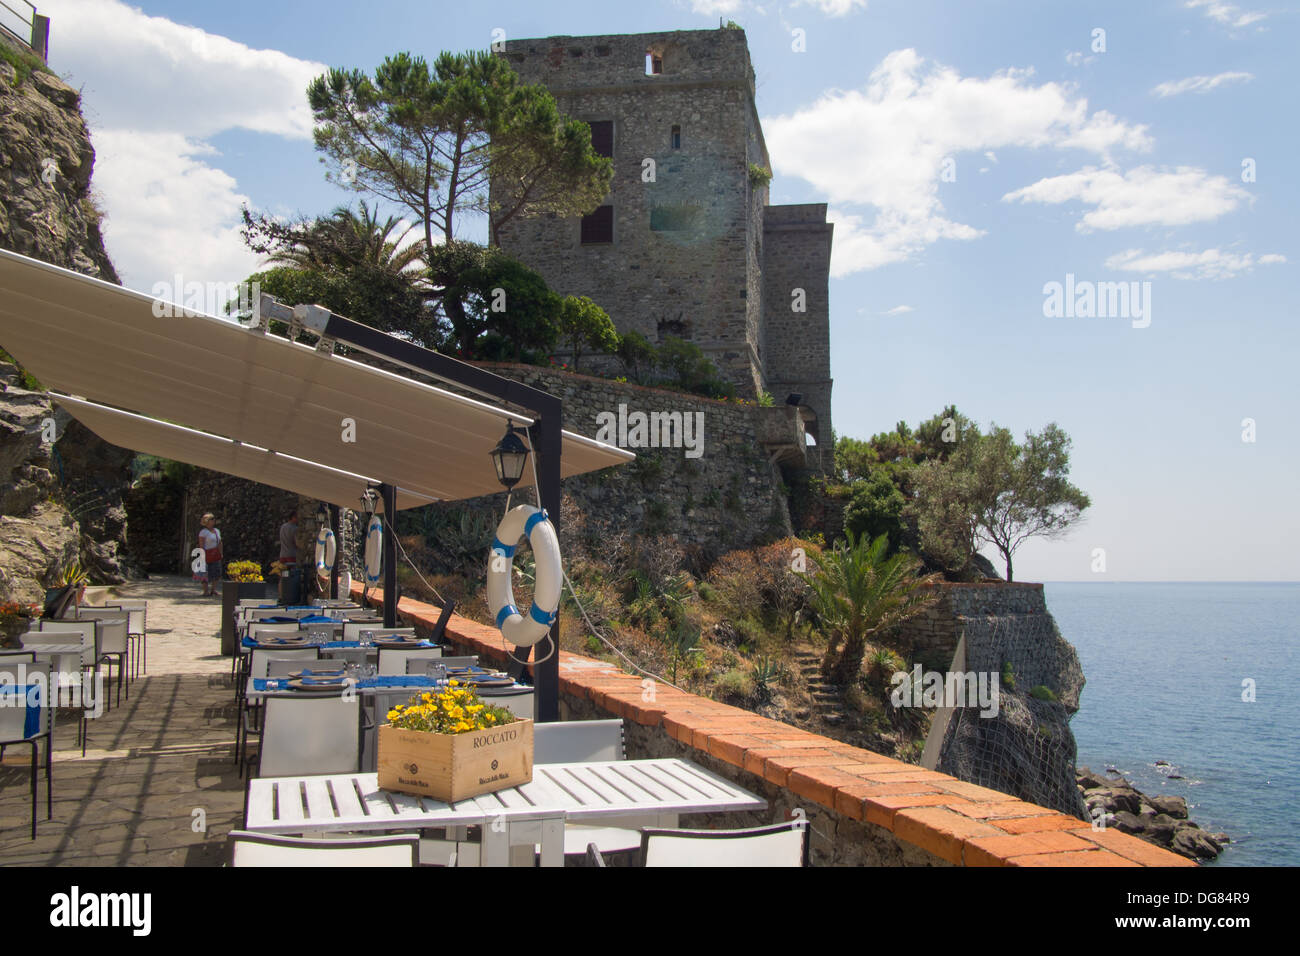 Restaurant at Monterosso al Mare, Cinque Terre (National Park & Unesco World Heritage Site), Liguria, Italy Stock Photo